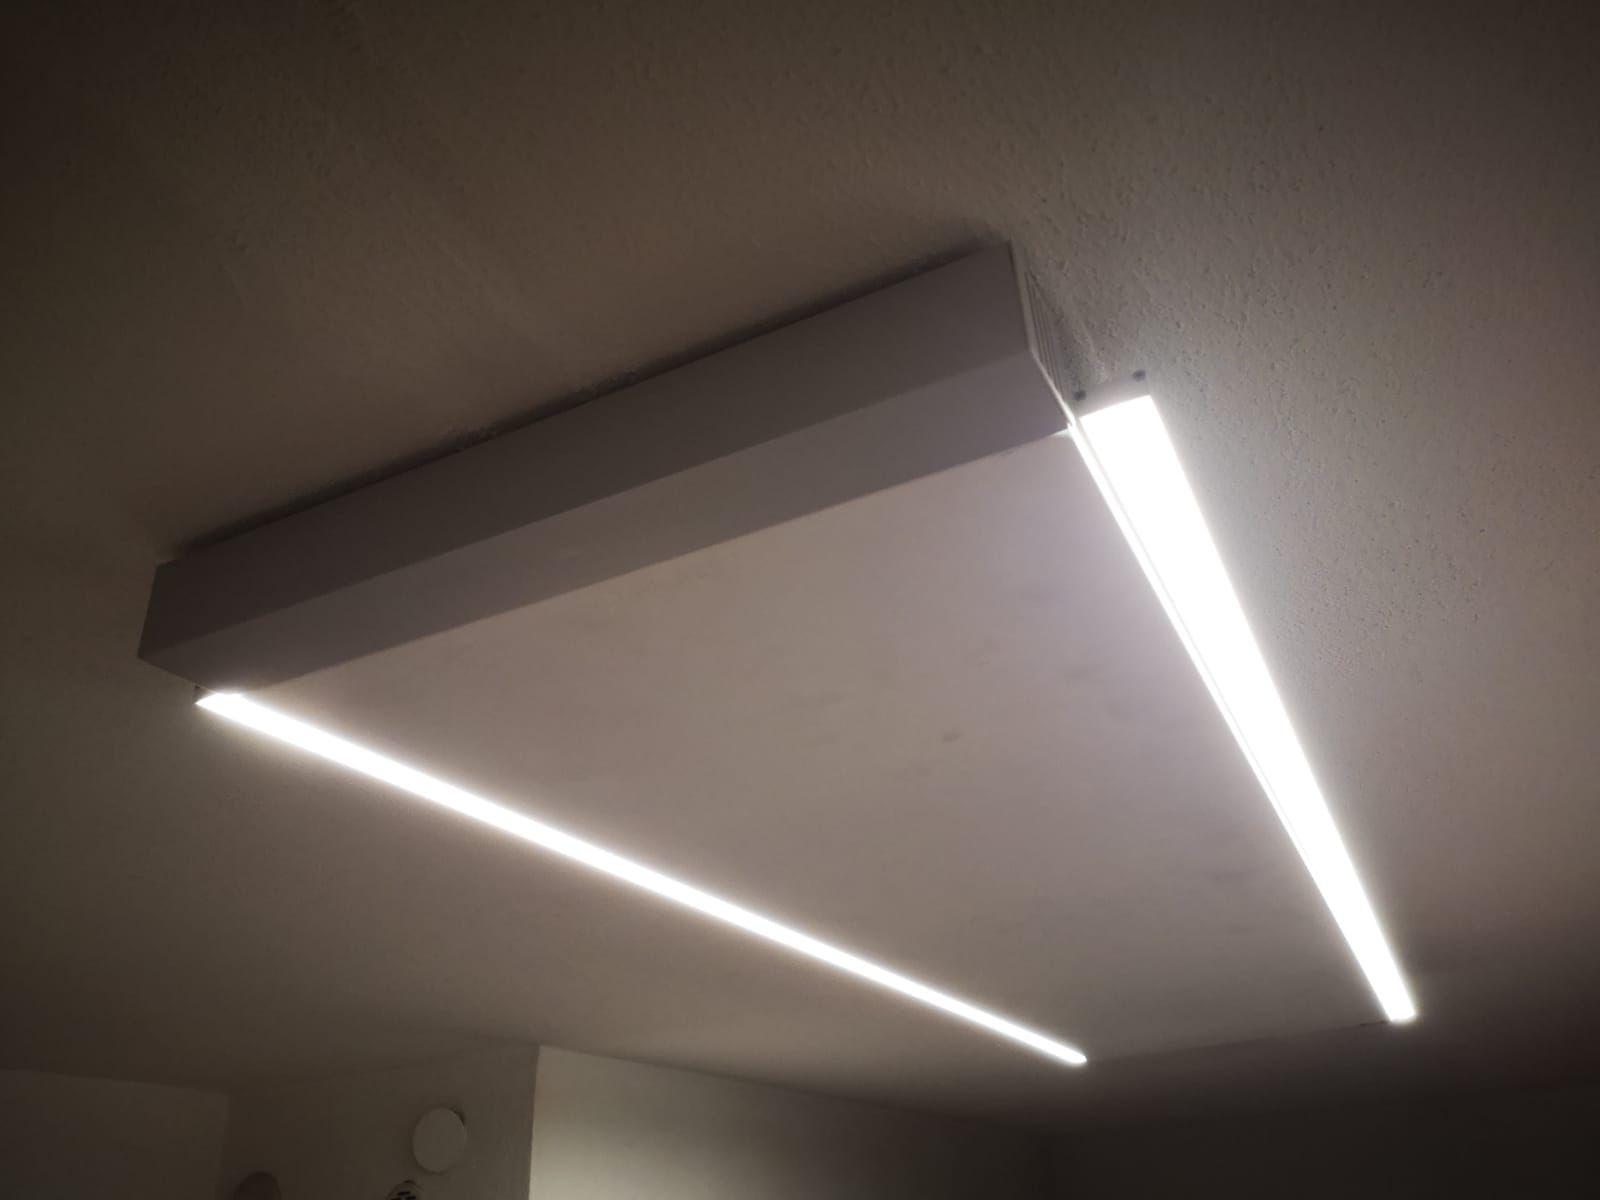 Redwell Infrarot Deckenheizung Mit Led Beleuchtung Spiegelheizung Infrarotheizung Beleuchtung